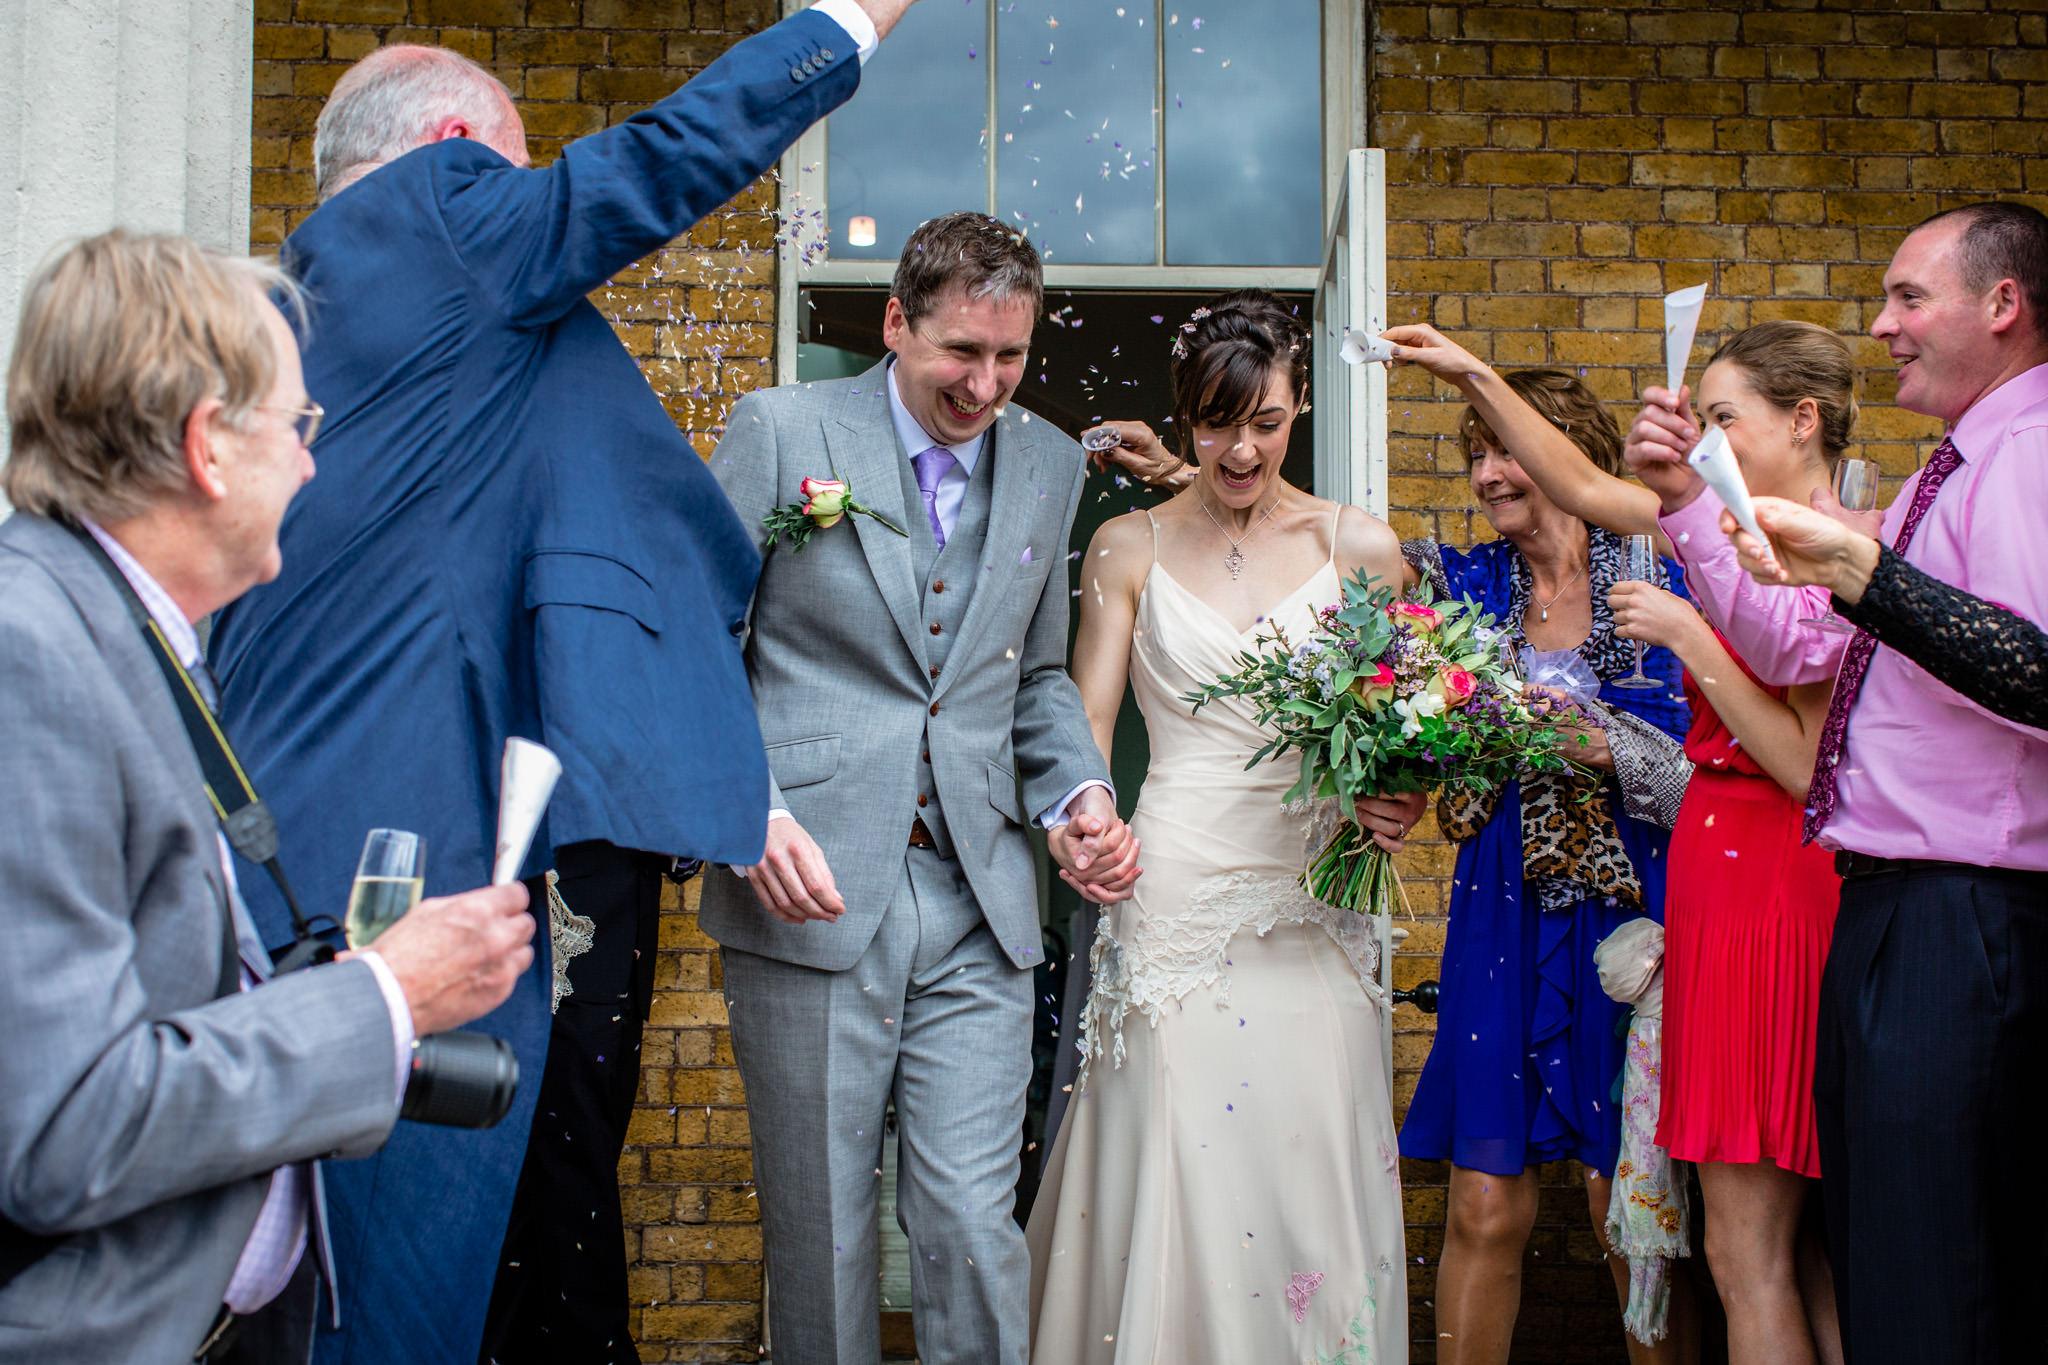 Clissold House wedding confetti shower